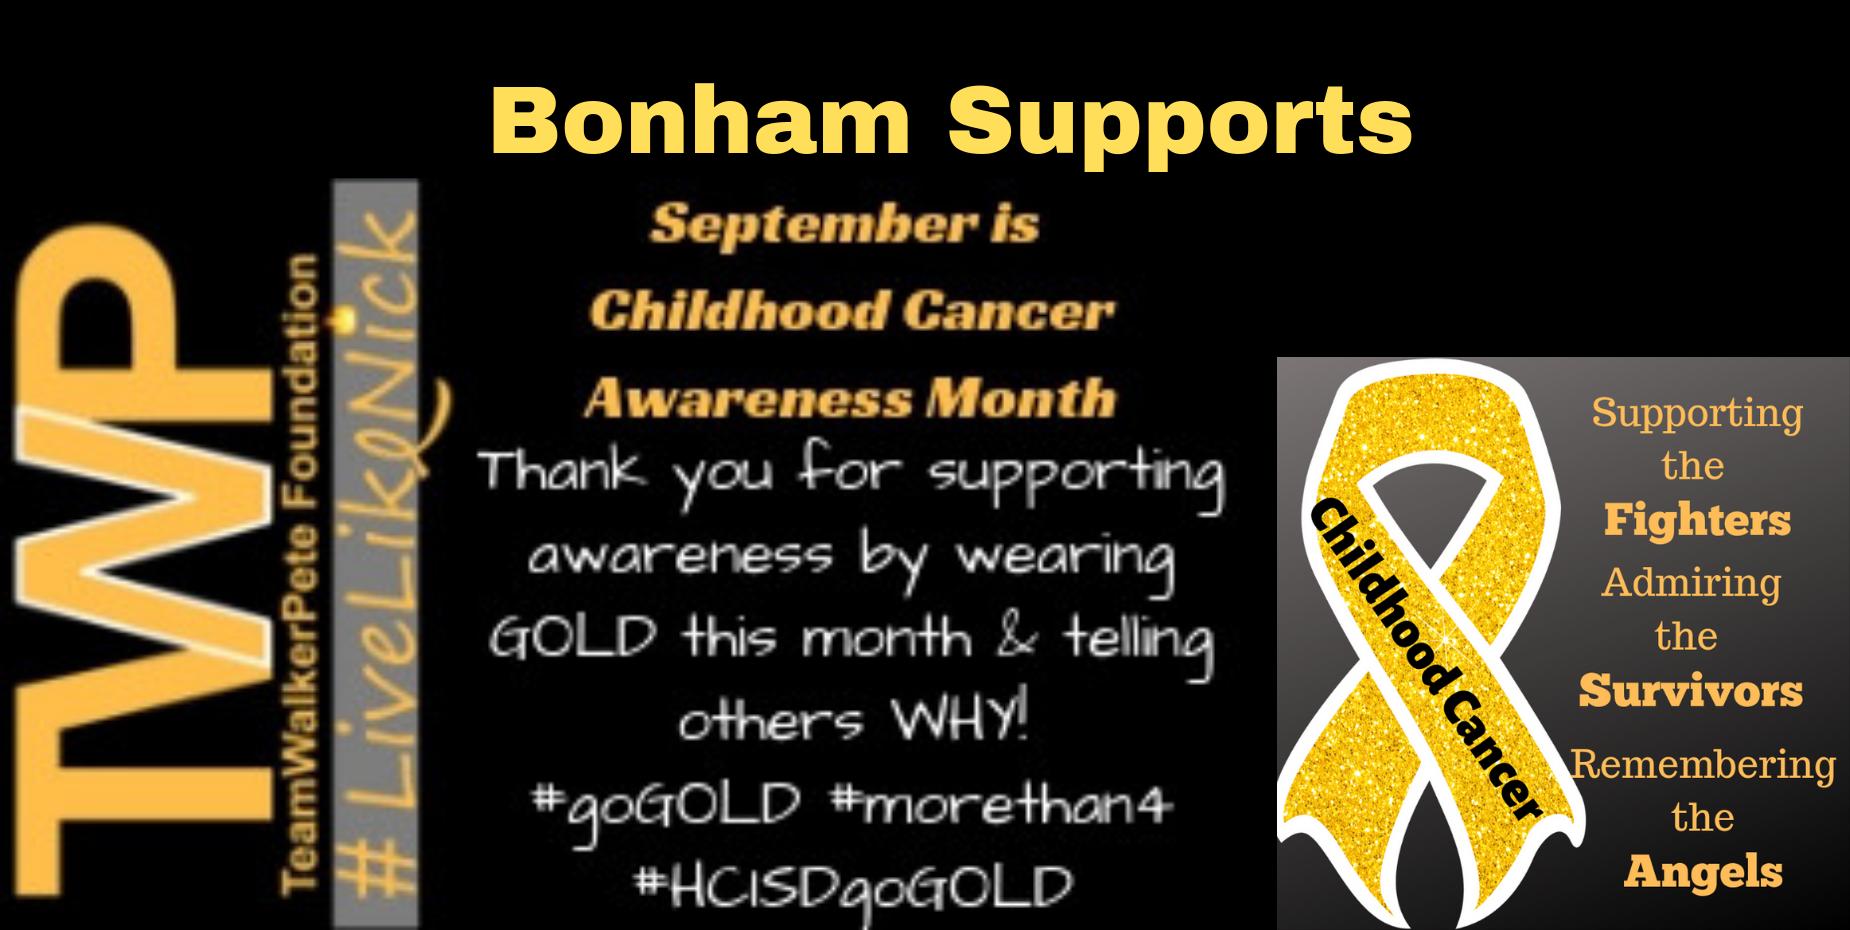 September Child Cancer Awareness Month